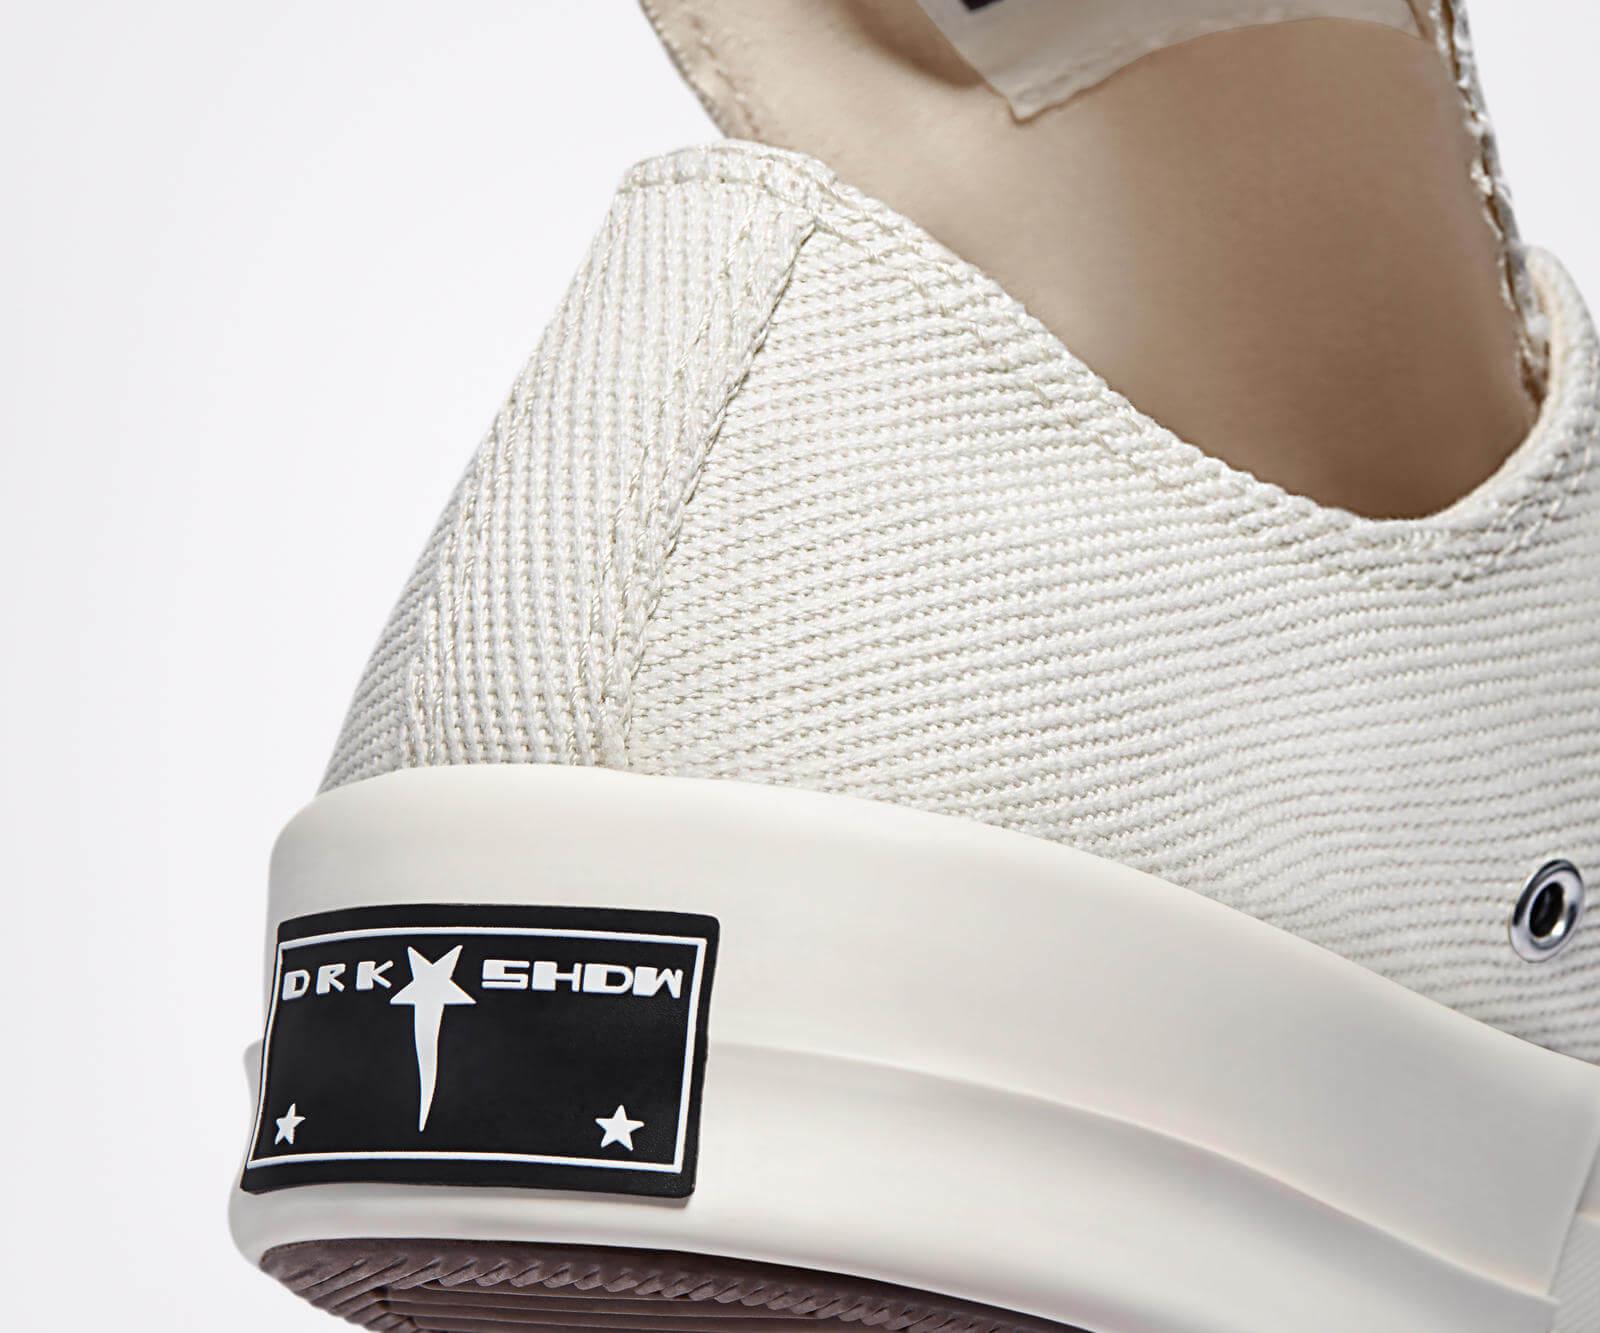 heel details of the Converse x Rick Owens - DRKSHDW - TurboDark Chuck 70 Low - white